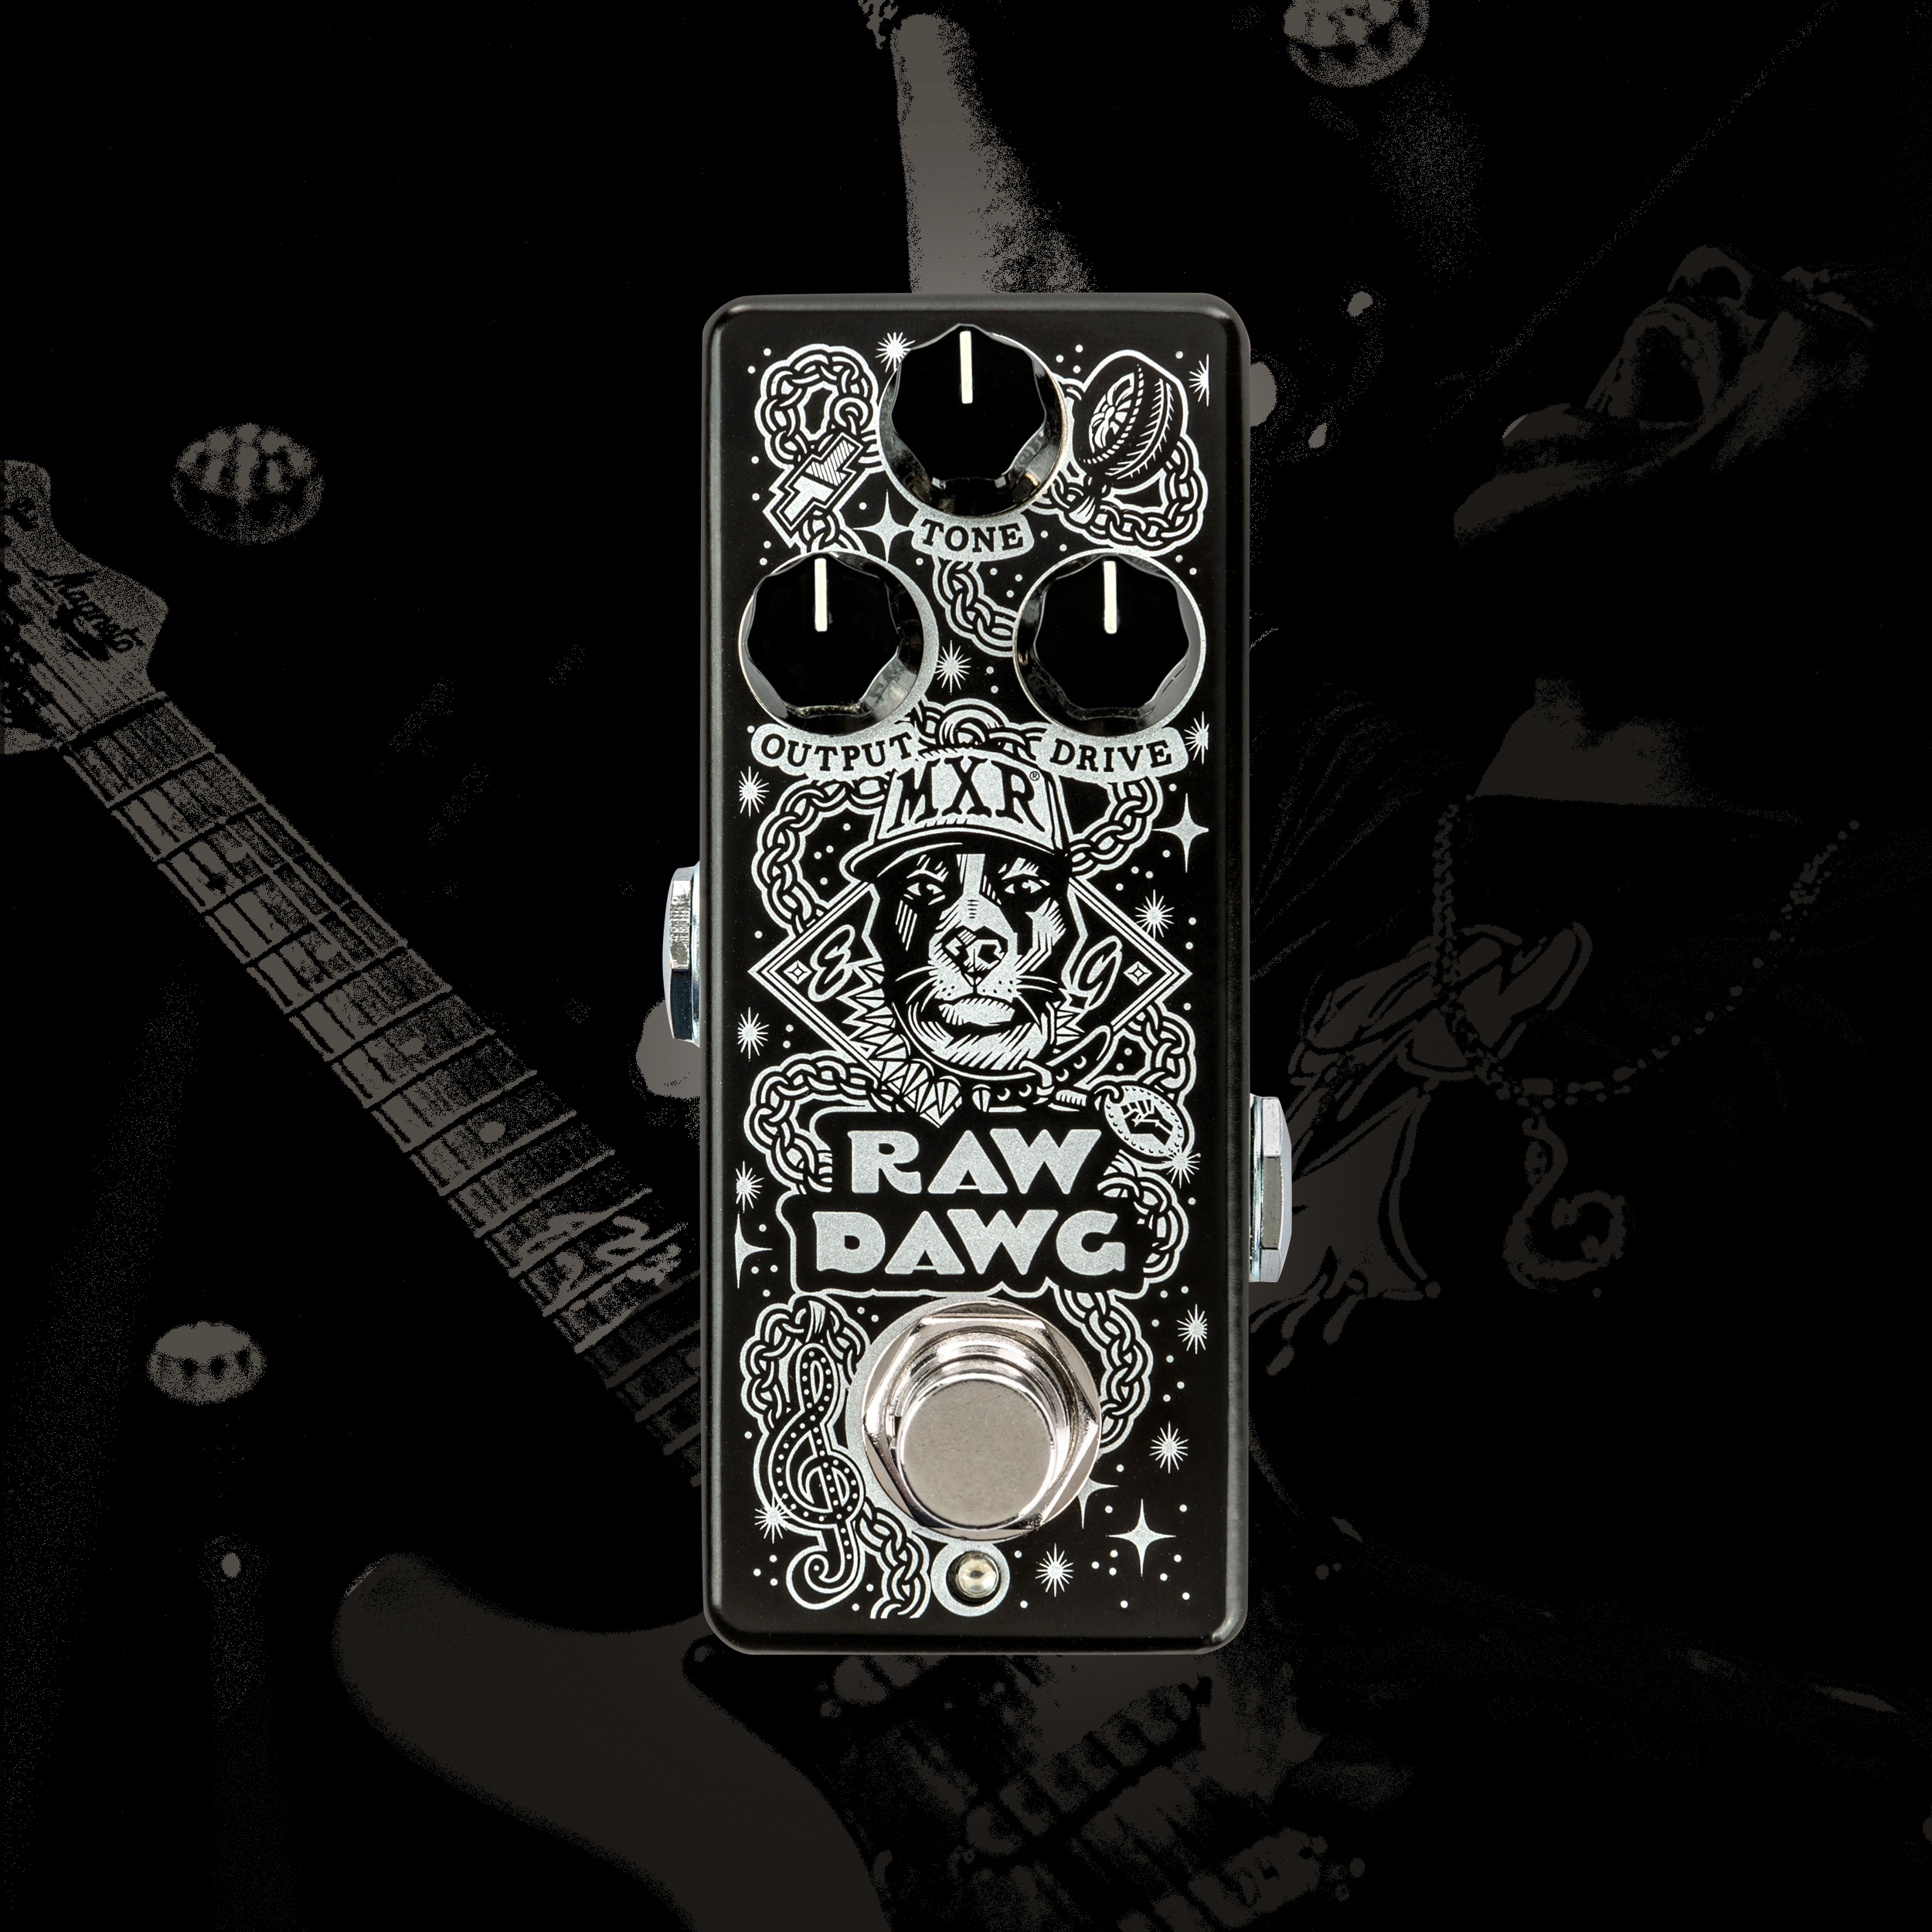 MXR EG74 Raw Dawg Overdrive